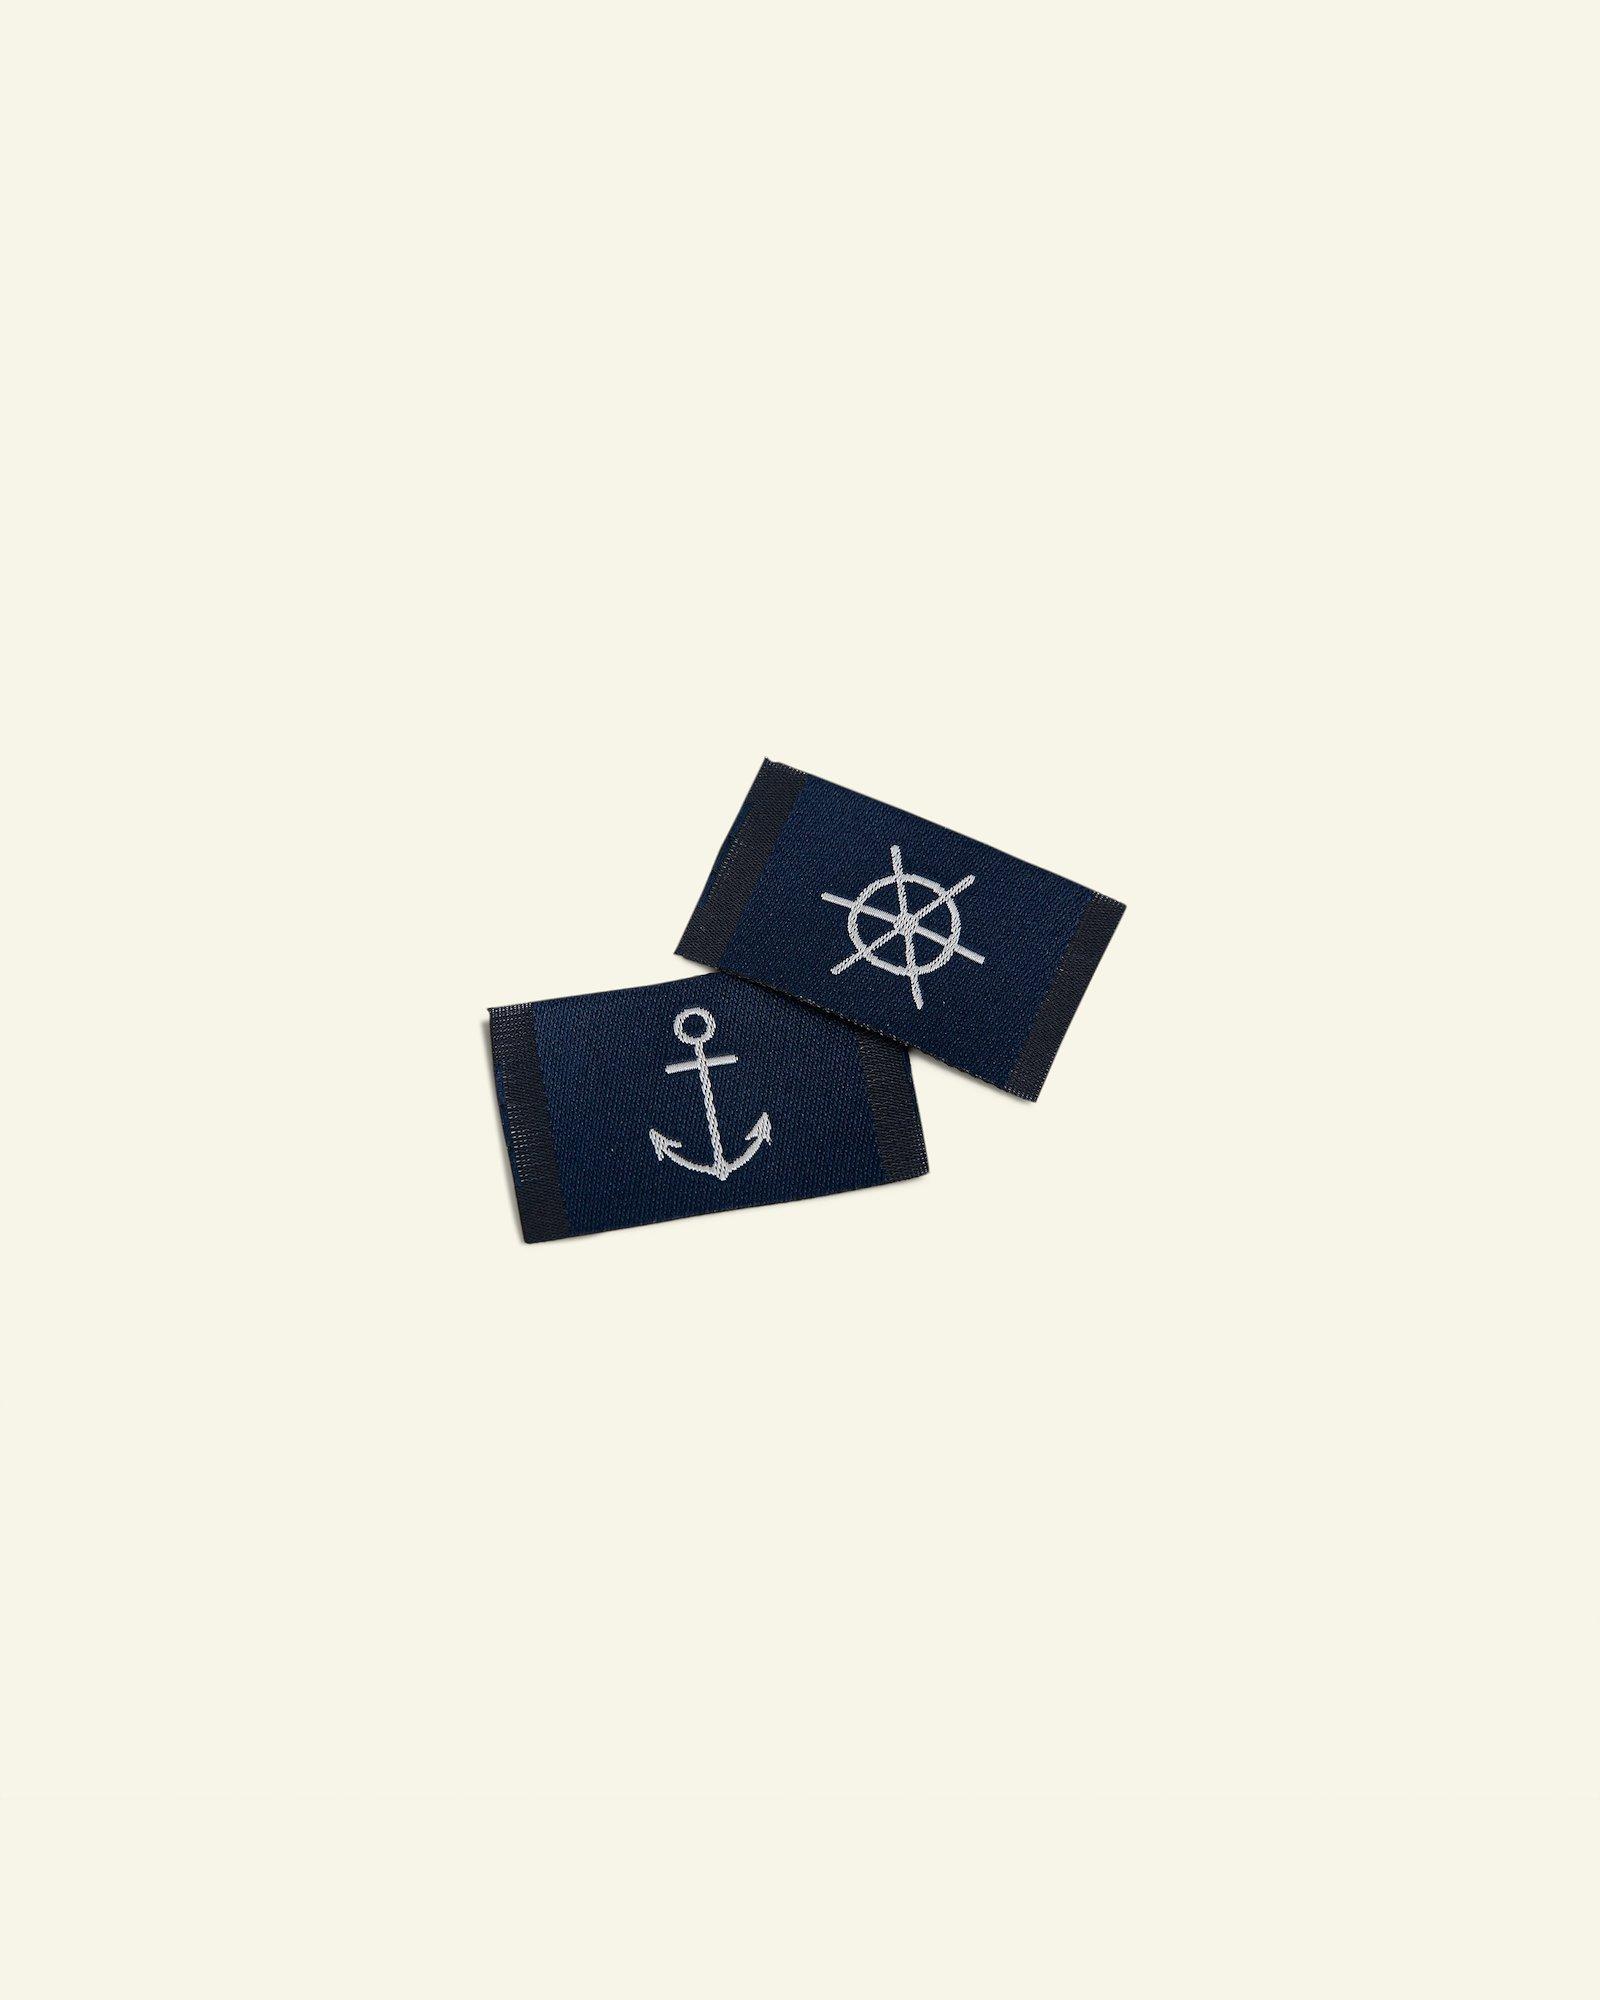 Patch anchor/helm 25x30mm navy 2pcs